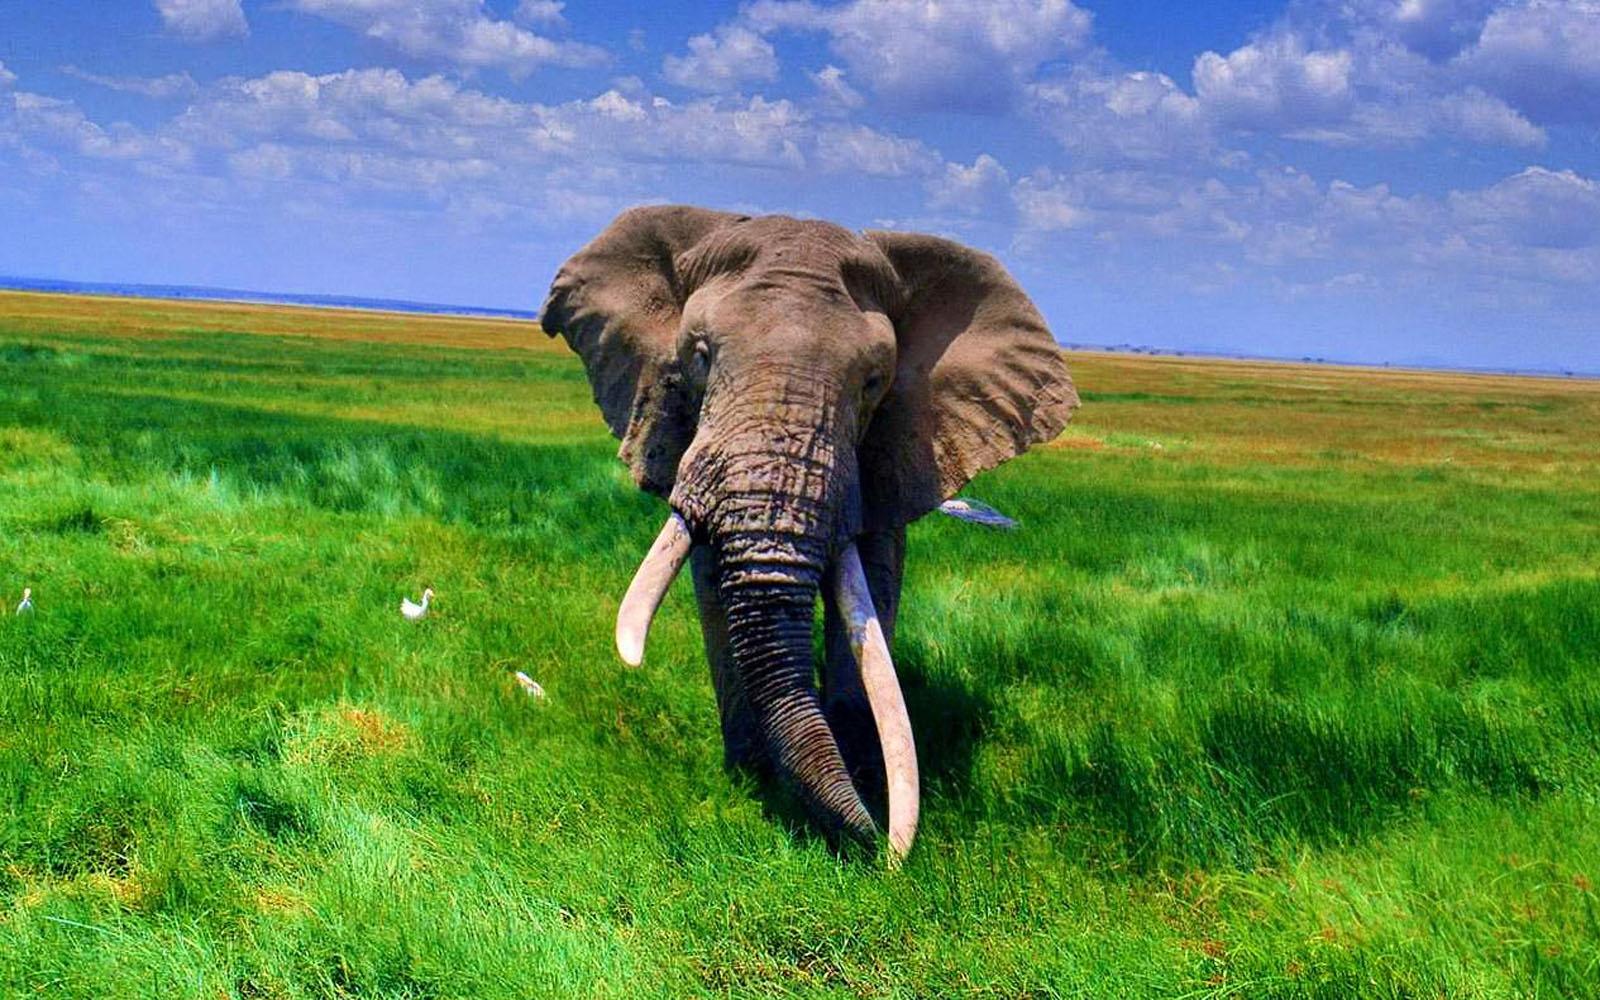 45+ Elephant Wallpaper for Desktop on WallpaperSafari